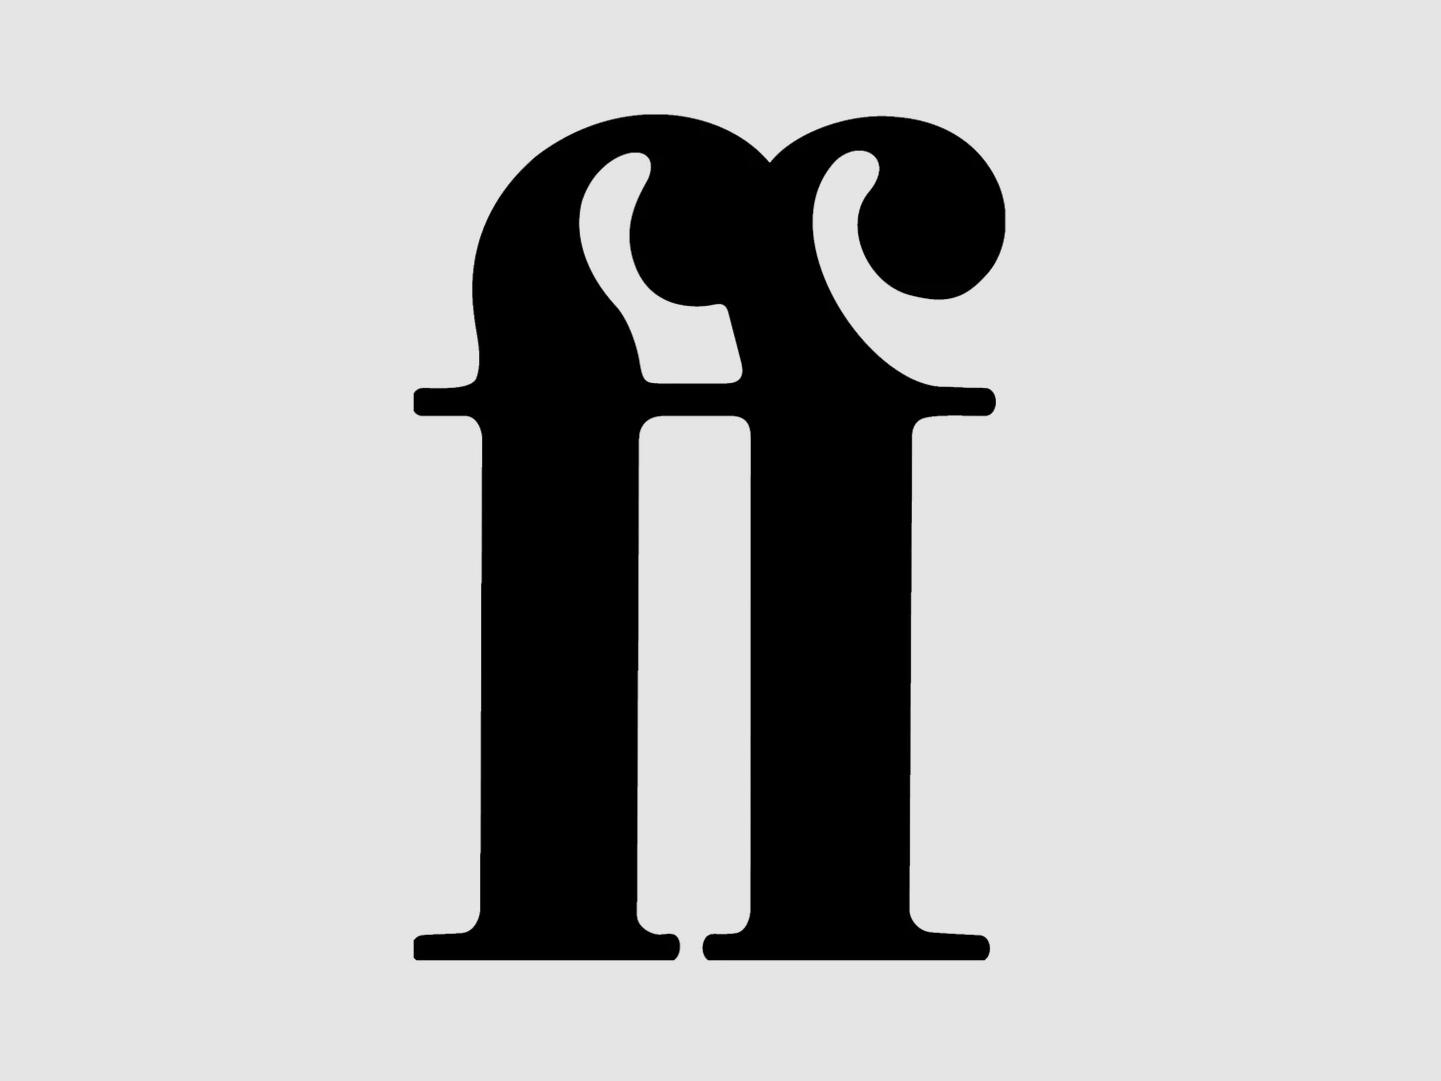 Faber_&_Faber_logo.jpg